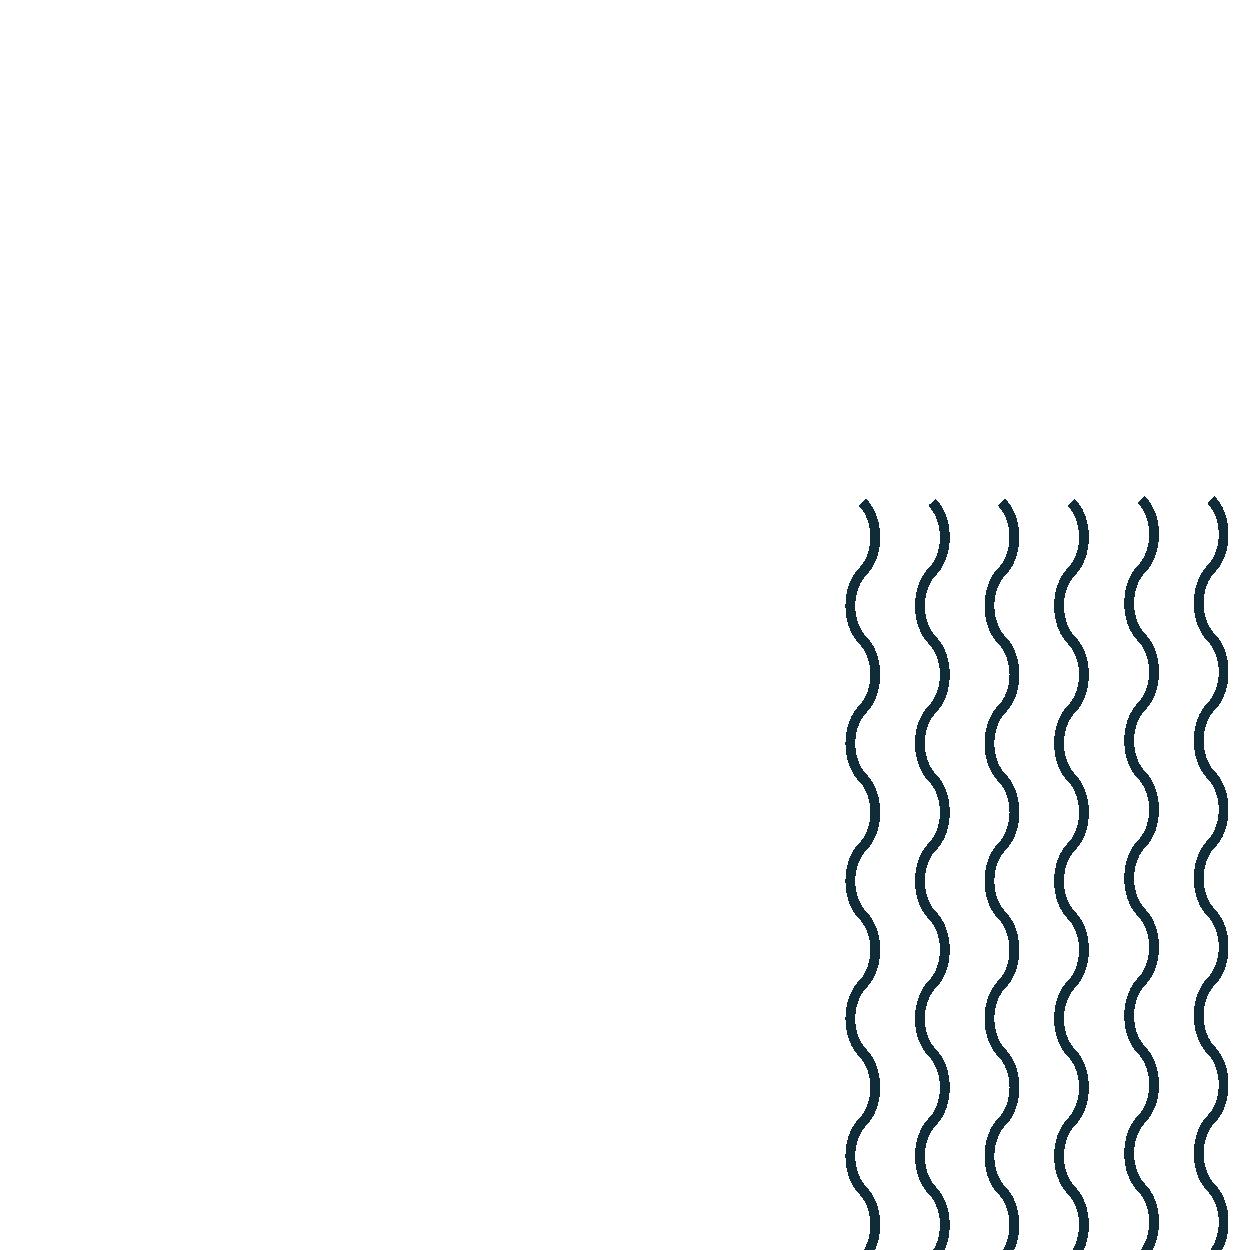 M/32 Terrace Homes | Shoreline, North Coogee Right Emblem